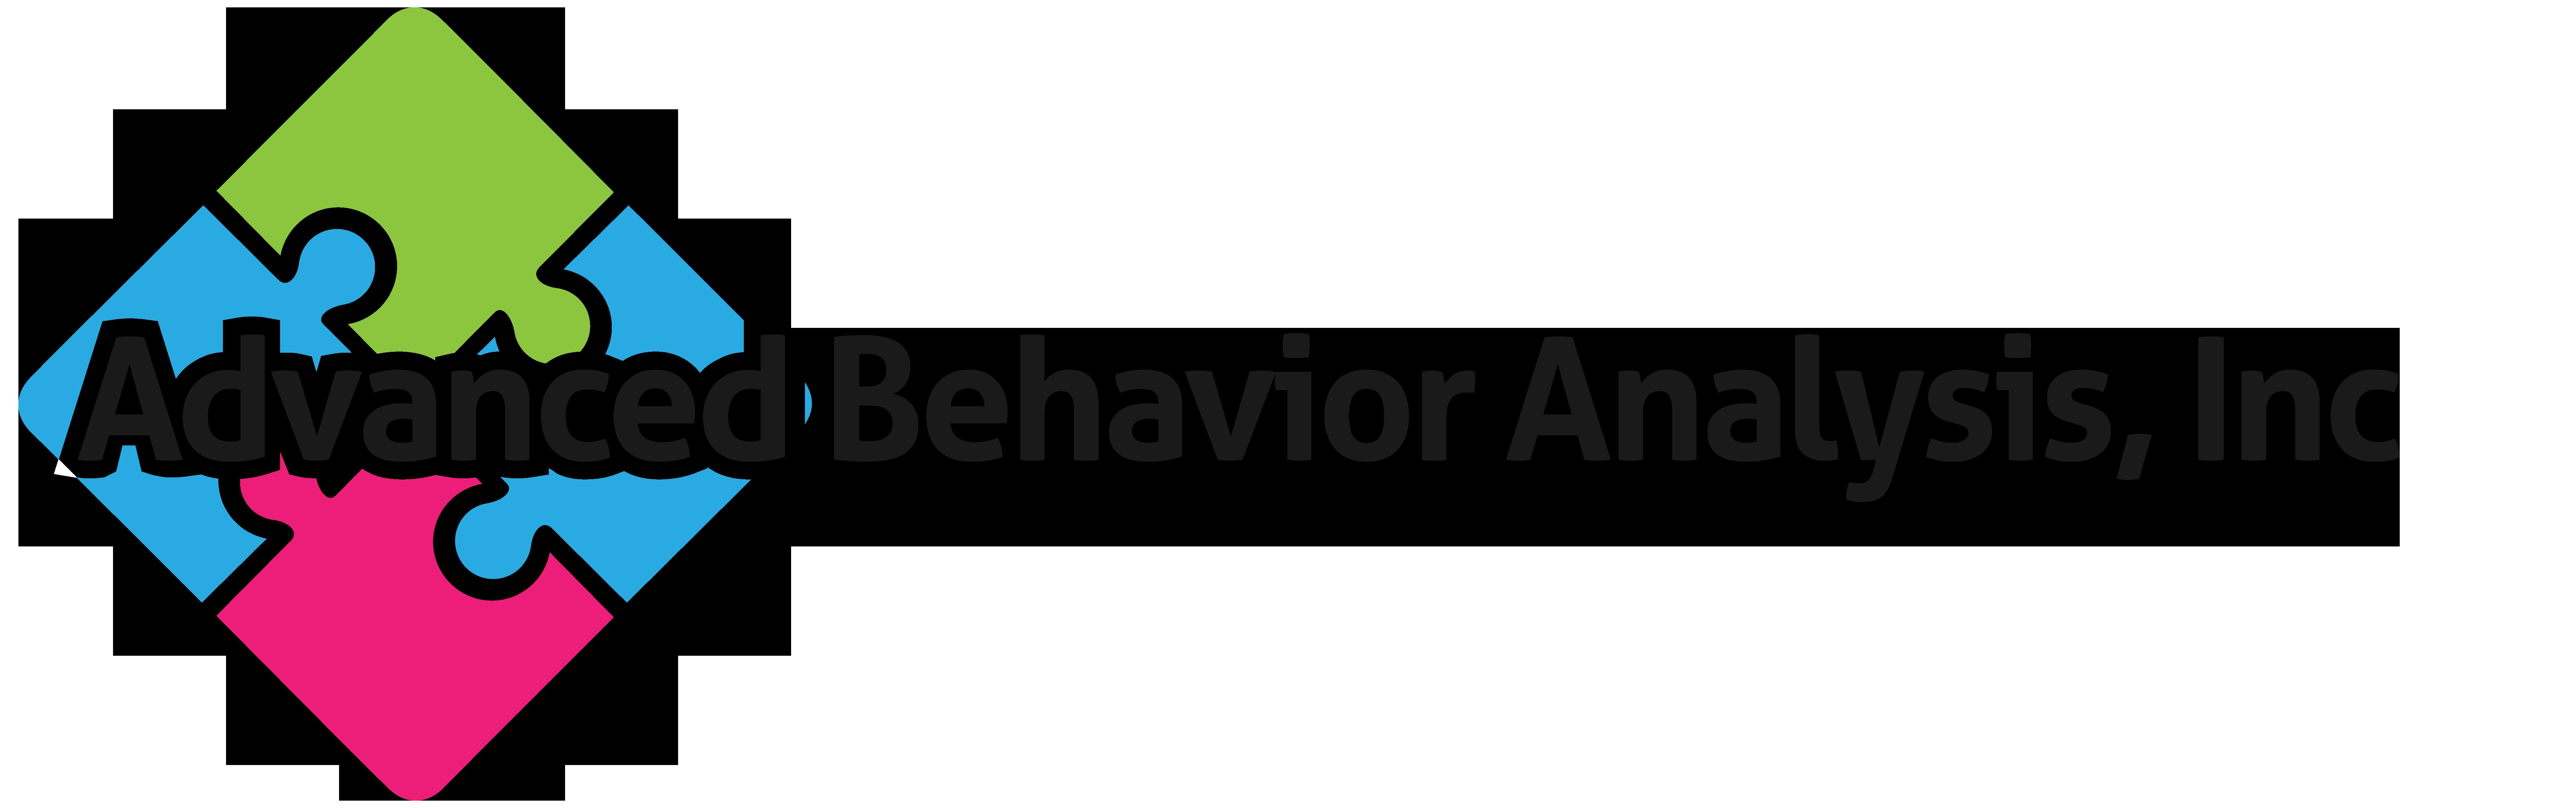 Advanced Behavior Analysis, Inc logo